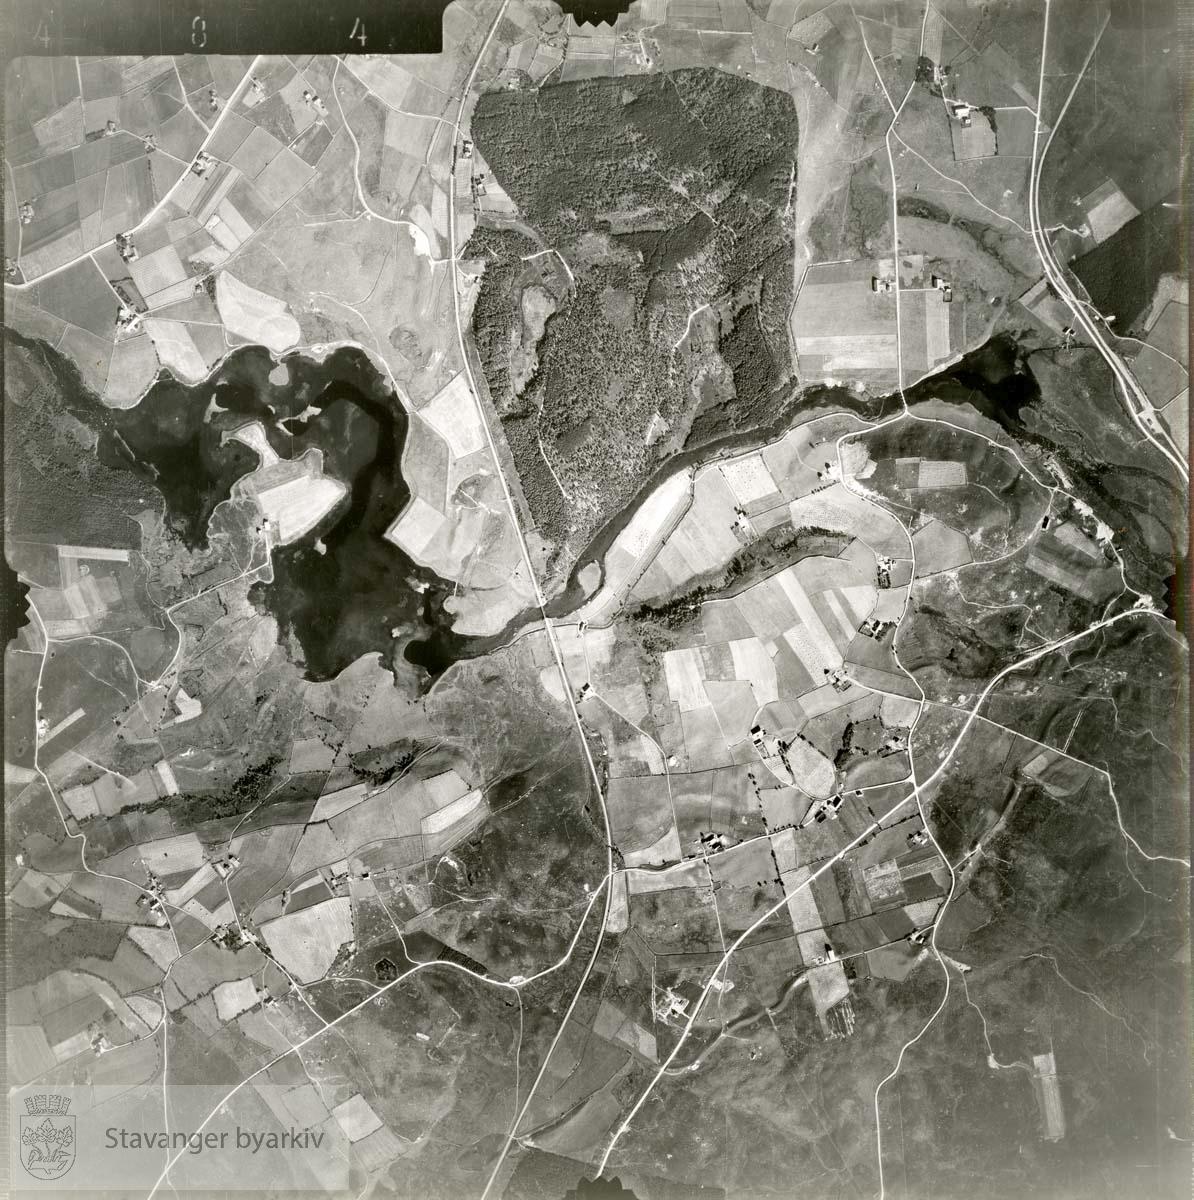 Jfr. kart/fotoplan E8/484..Orstad, Skjæveland, Vagleskogen..Se ByStW_Uca_002 (kan lastes ned under fanen for kart på Stavangerbilder)